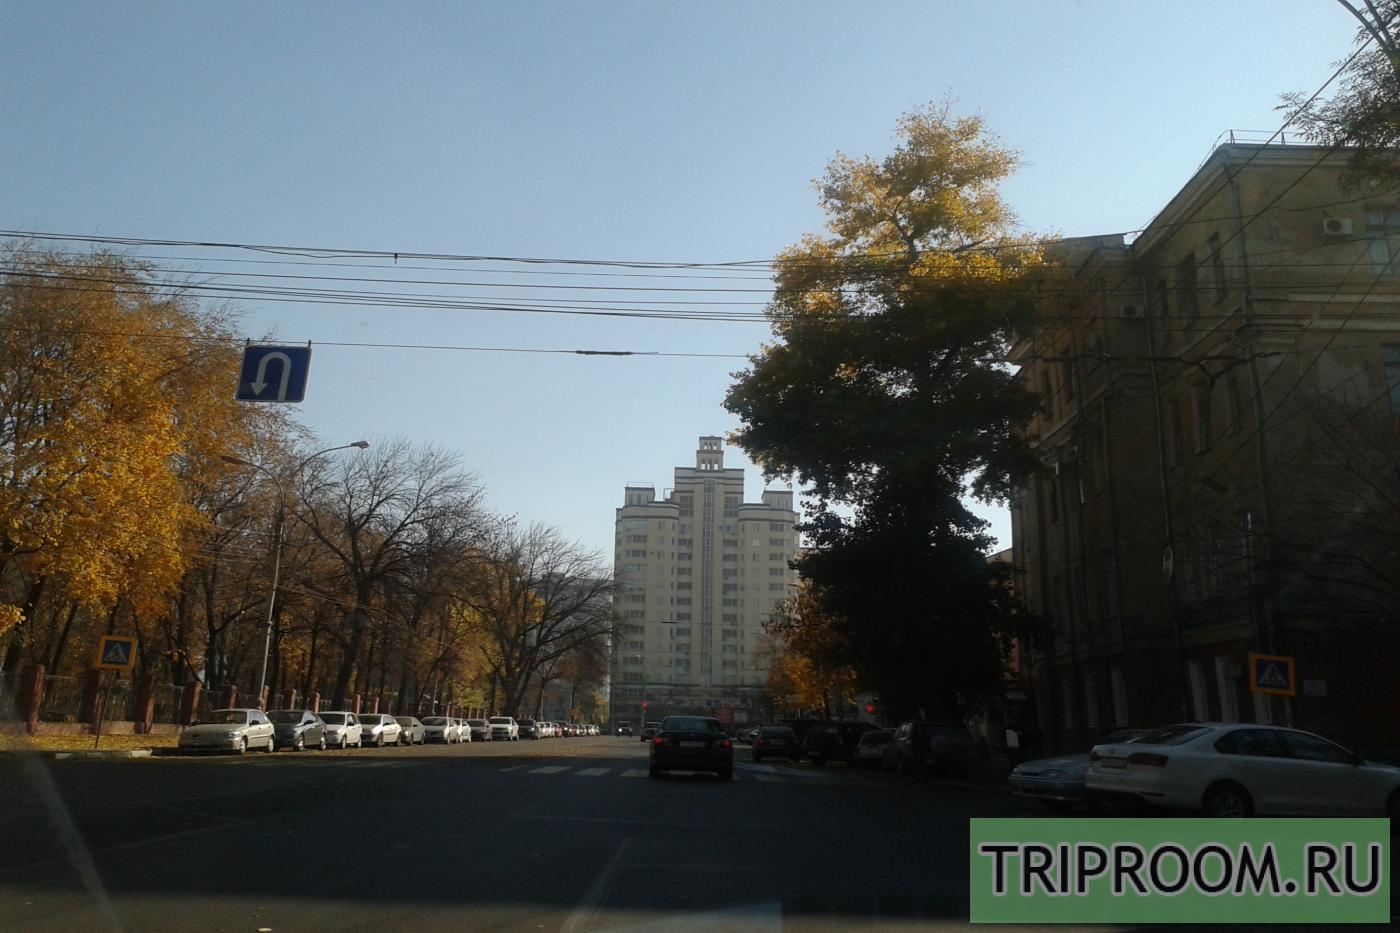 1-комнатная квартира посуточно (вариант № 591), ул. Революции проспект, фото № 9